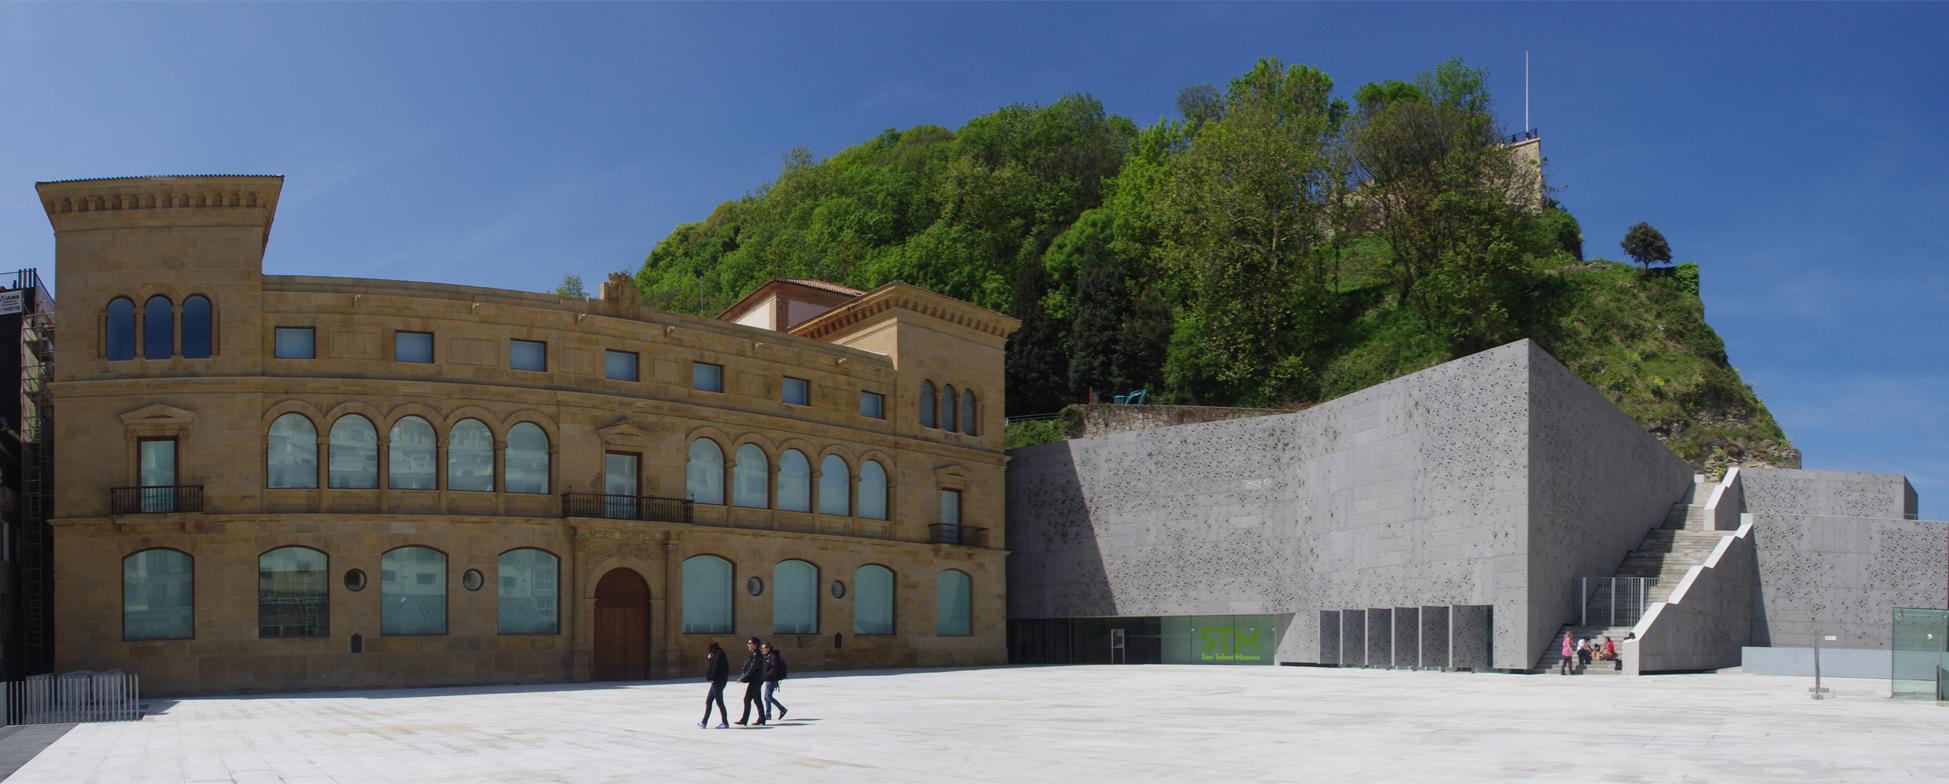 Museo San Telmo en San Sebastián (Guipúzcoa) - Hotel en el País Vasco